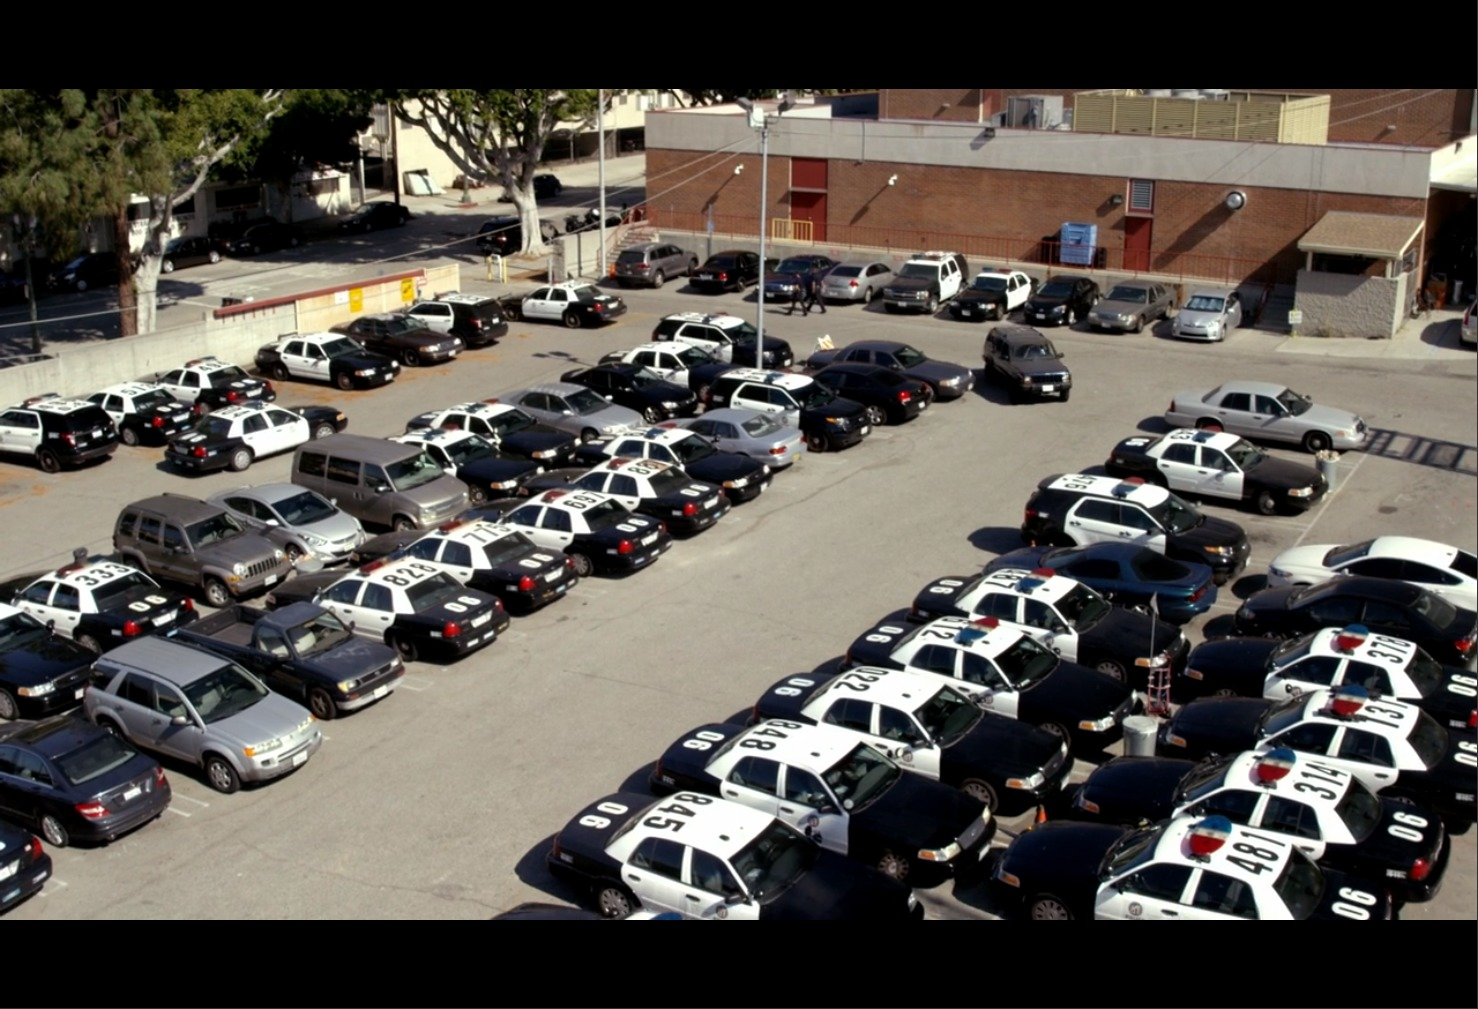 AmazonプライムビデオBOSCH警察署の駐車場の画像